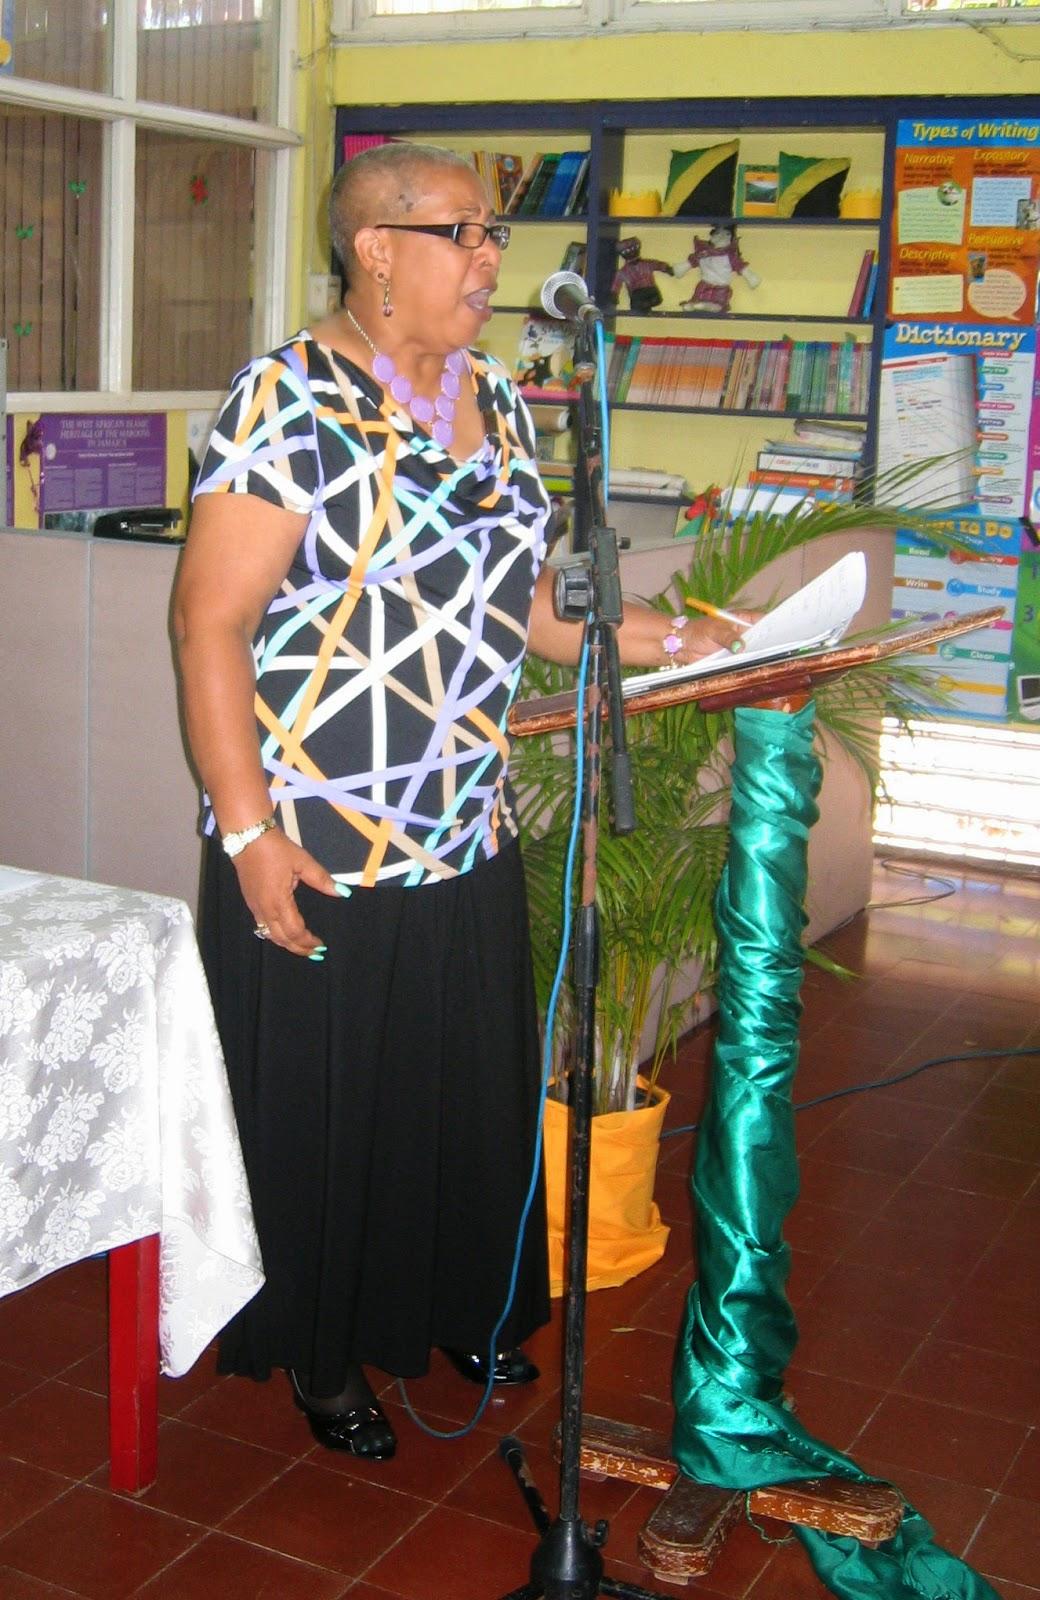 jcdc creative writing 2012 Dog-heart ebook: diana mccaulay  she has written two novels, dog-heart (2010) and huracan (2012),  --judges' report, jcdc creative writing competition.